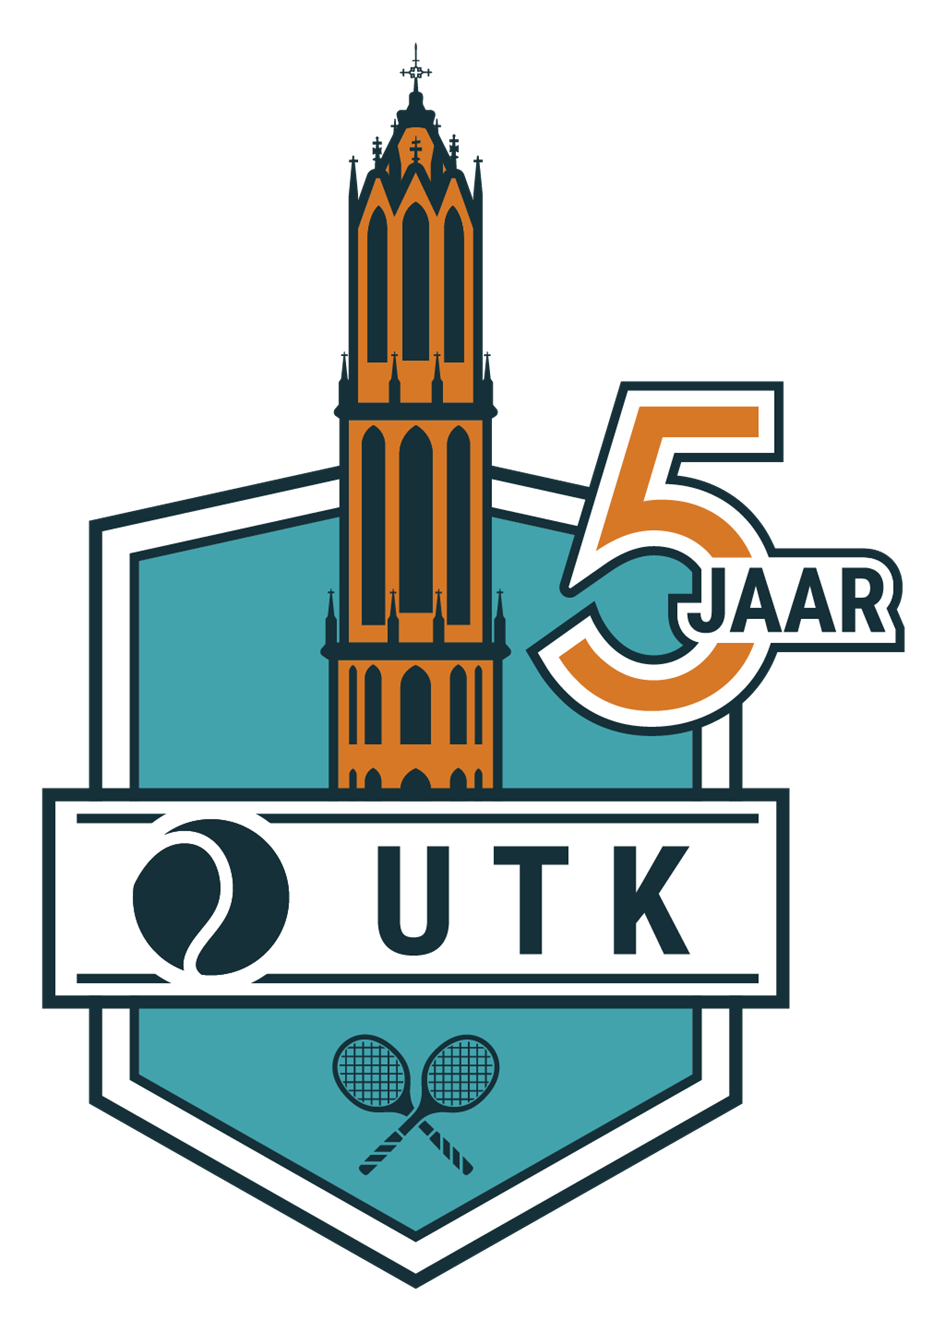 UTK-logo-5jaar.png